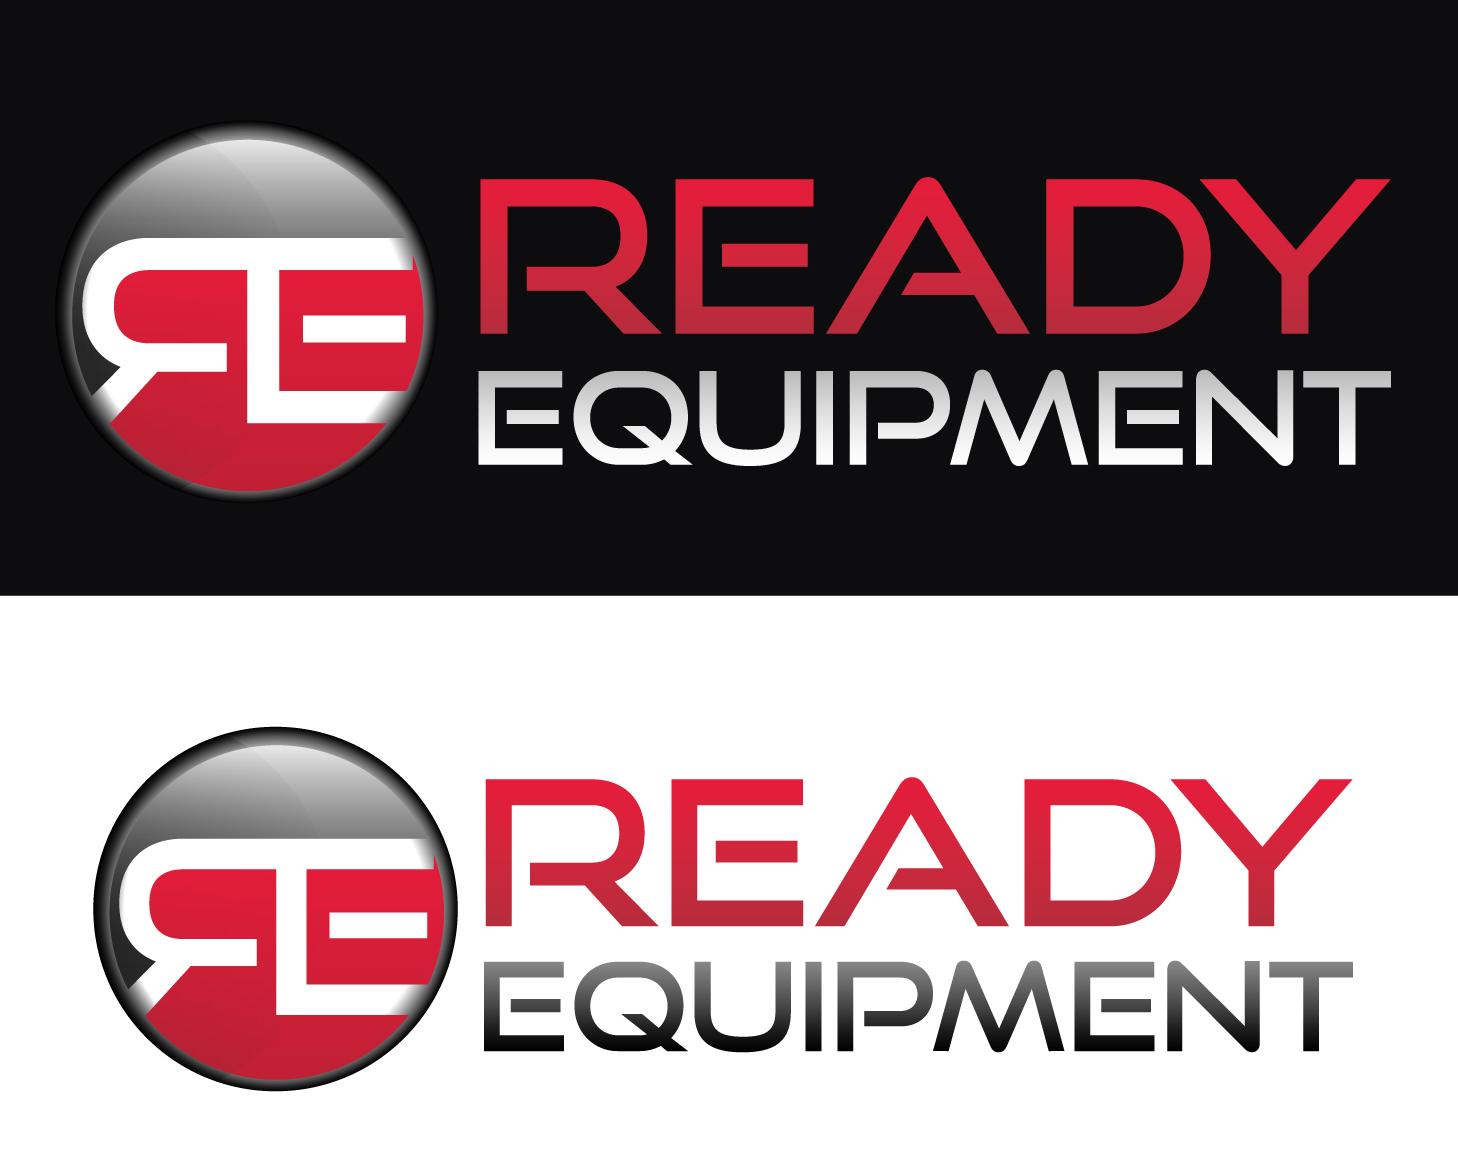 Logo Design by rA - Entry No. 168 in the Logo Design Contest Ready Equipment  Logo Design.